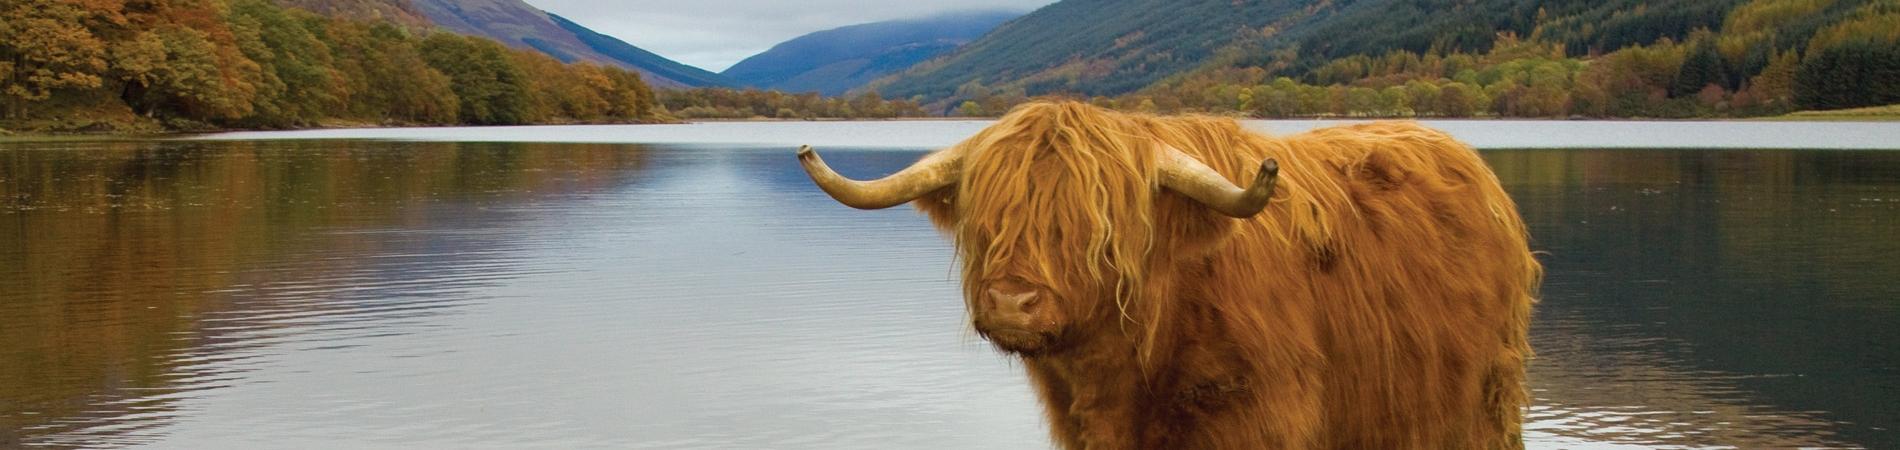 Highland Cow at Lochs and Glens Loch Achray Hotel.